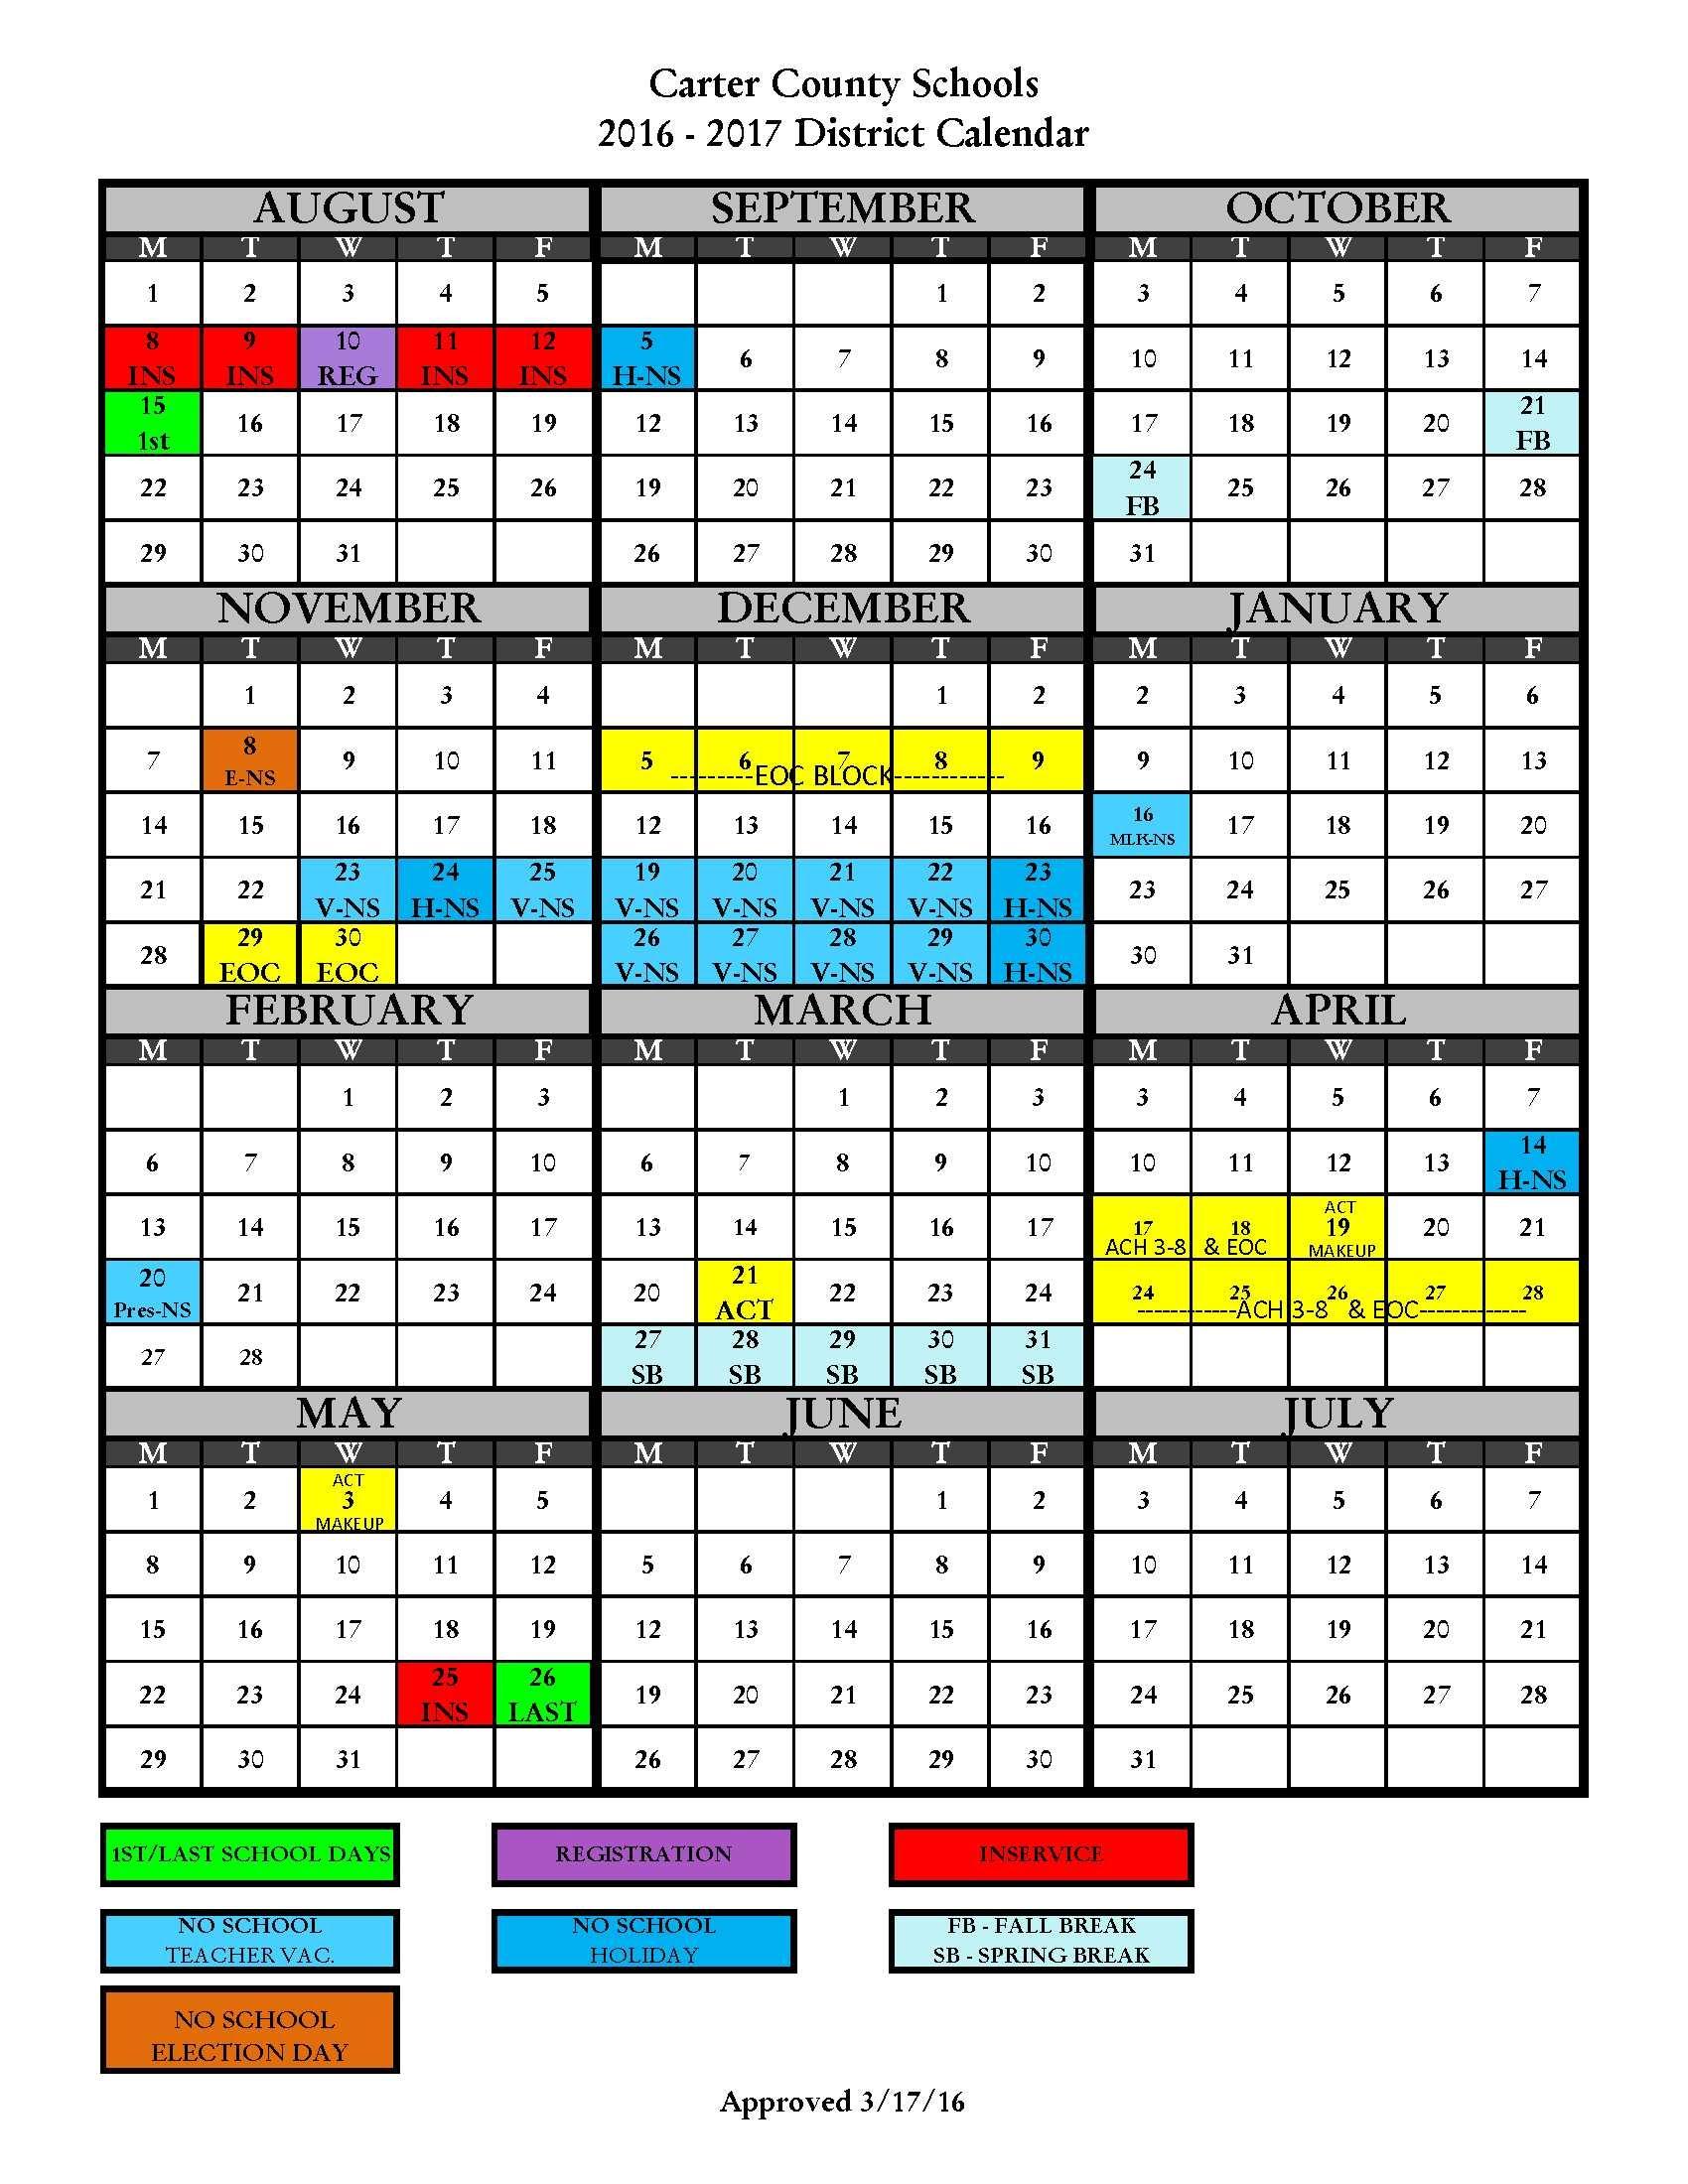 2016 2017 District Calendar - Carter County Schools Intended For Alachua School Board Calendar